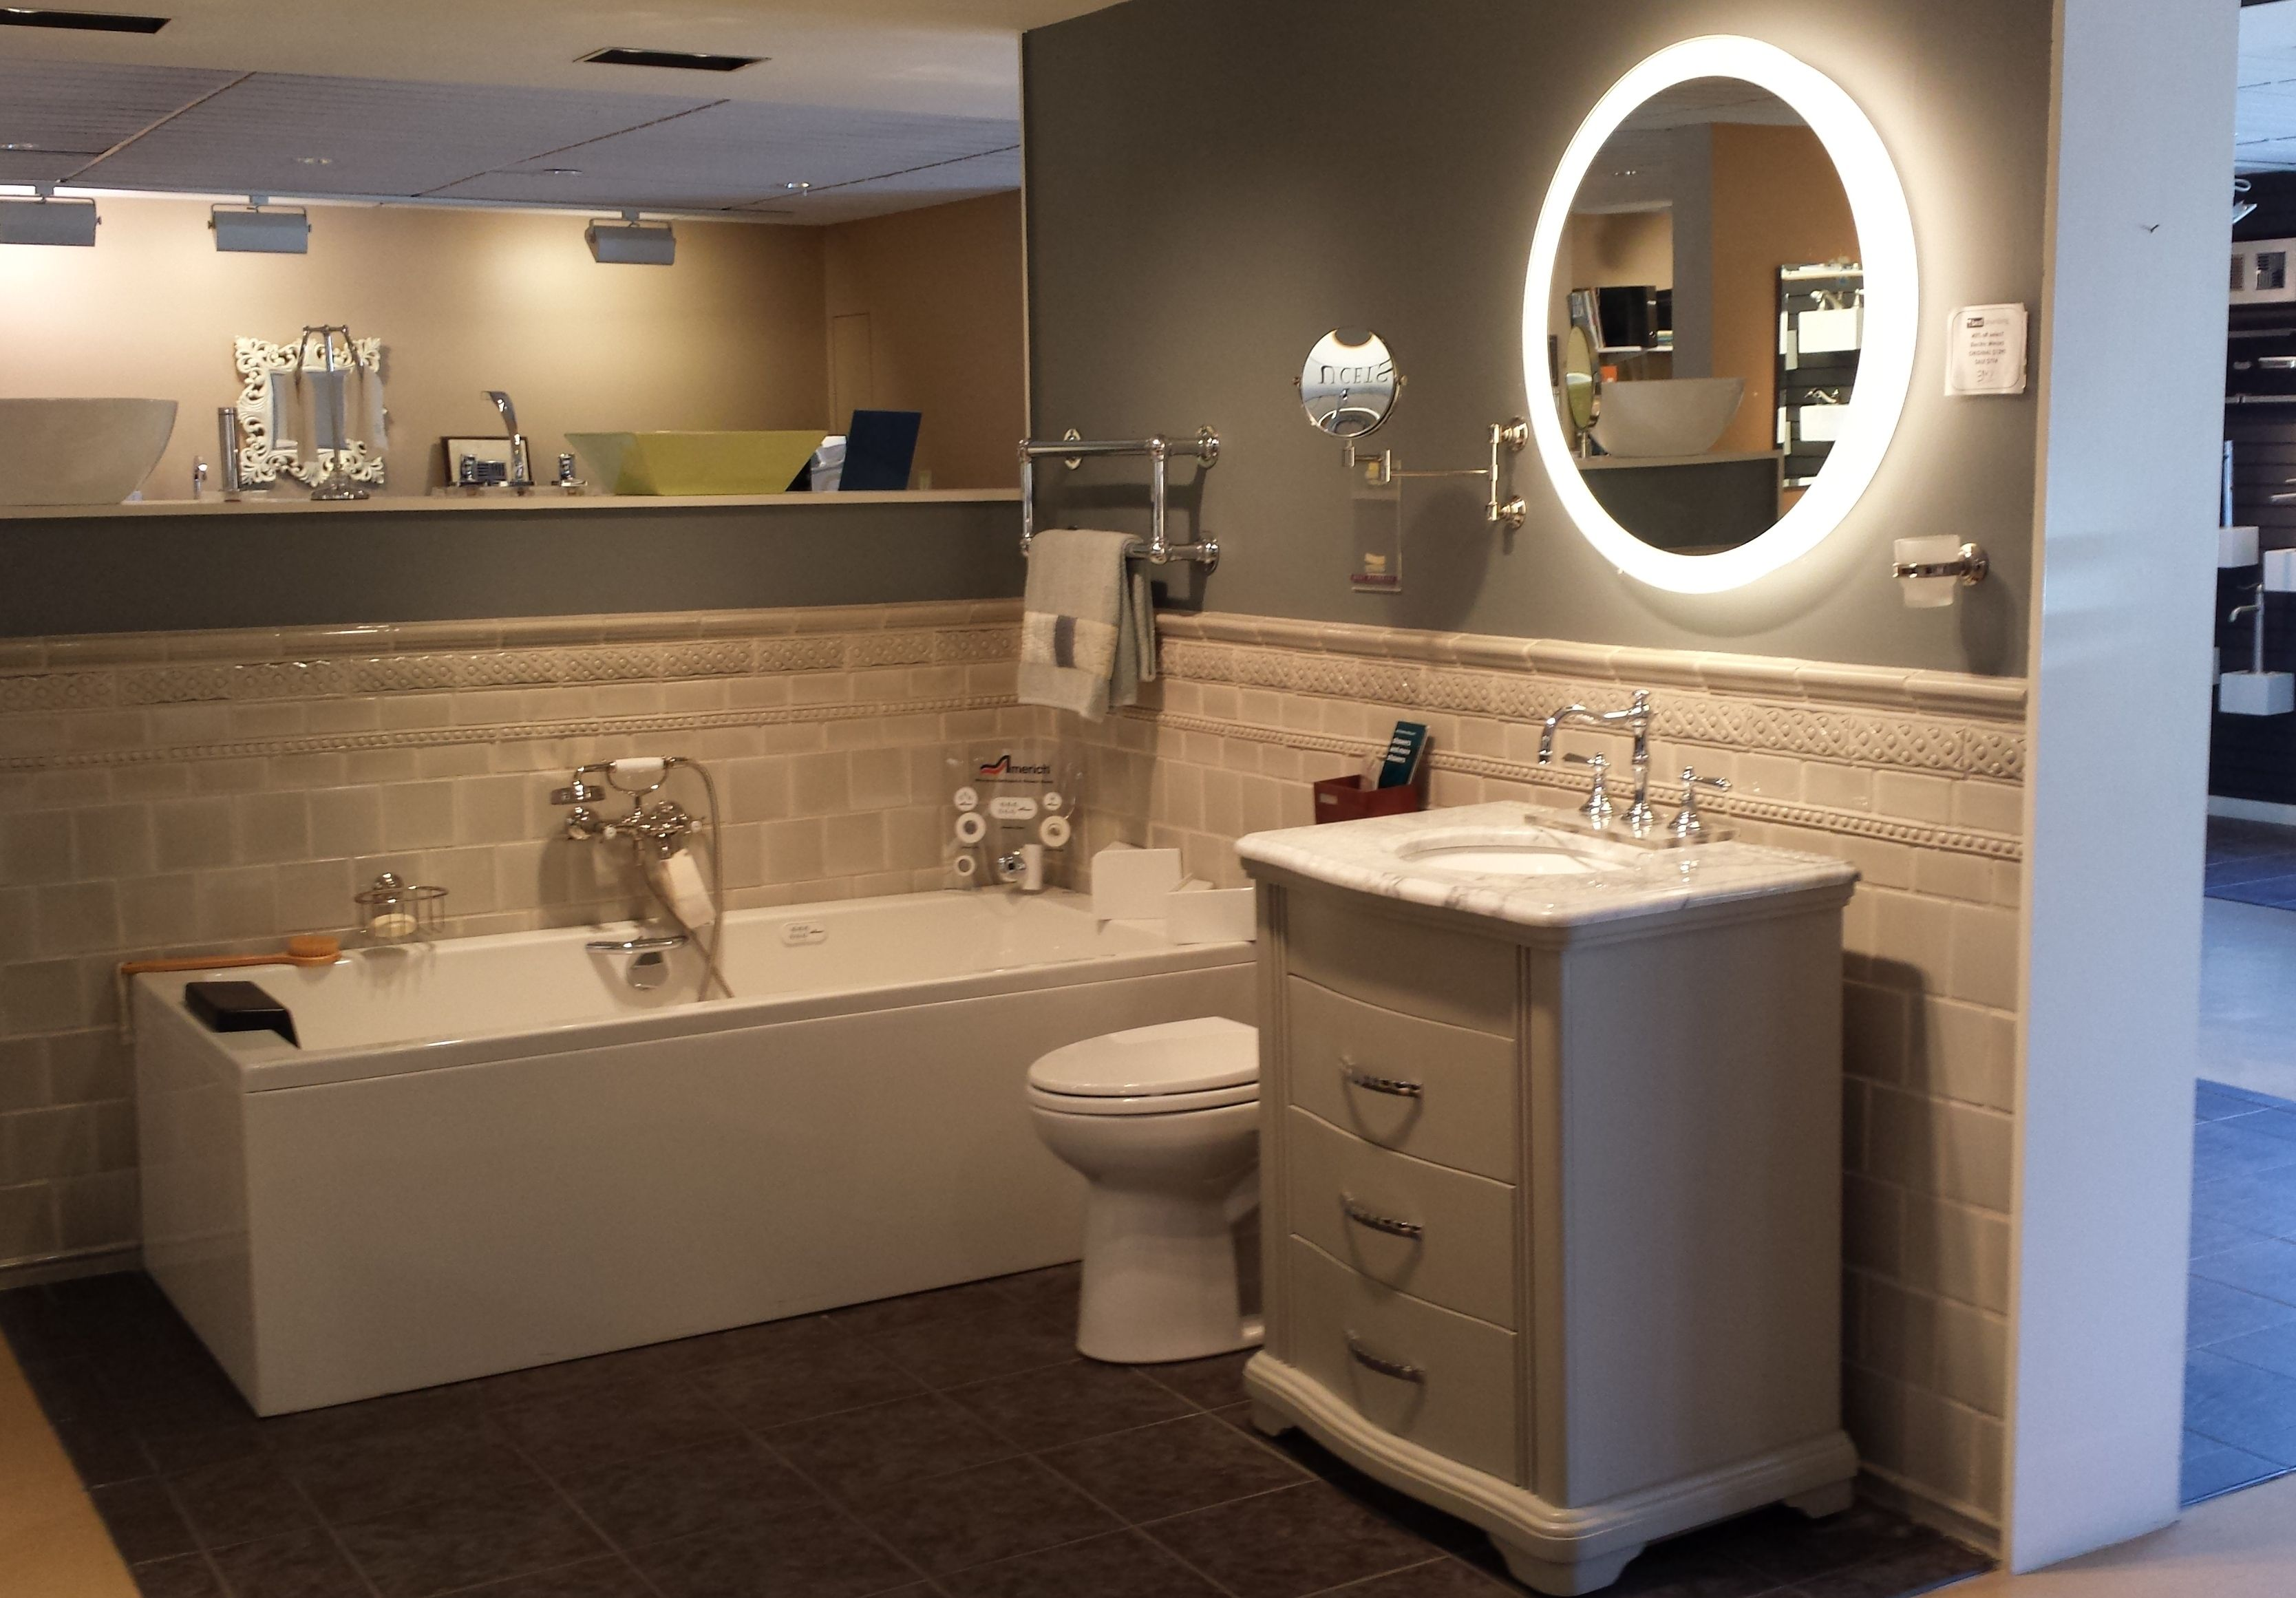 Ryvyr brandy vanity americh tub electric mirror and for Drakes bathrooms